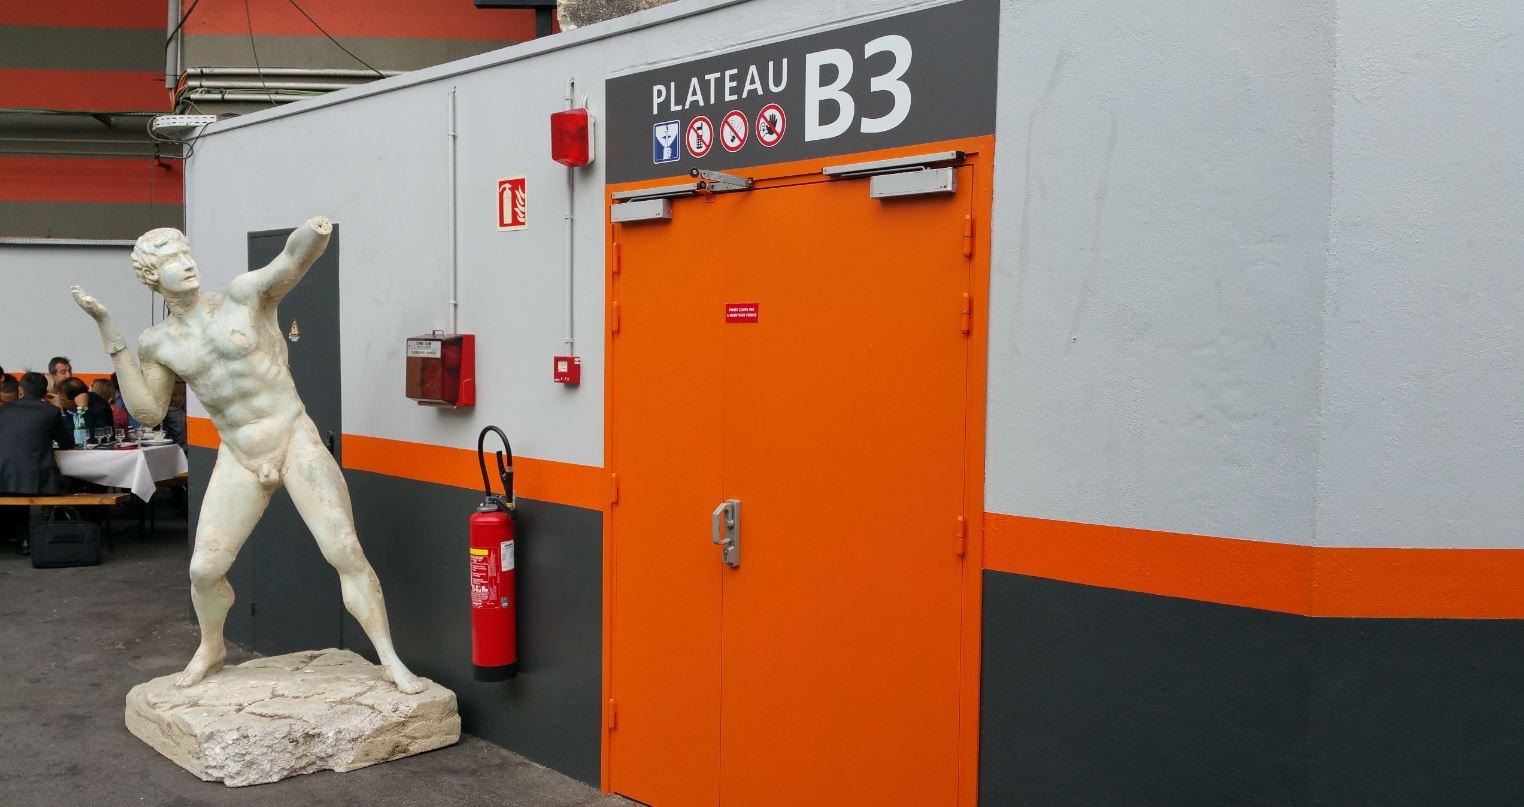 plateau b3 studios de bry